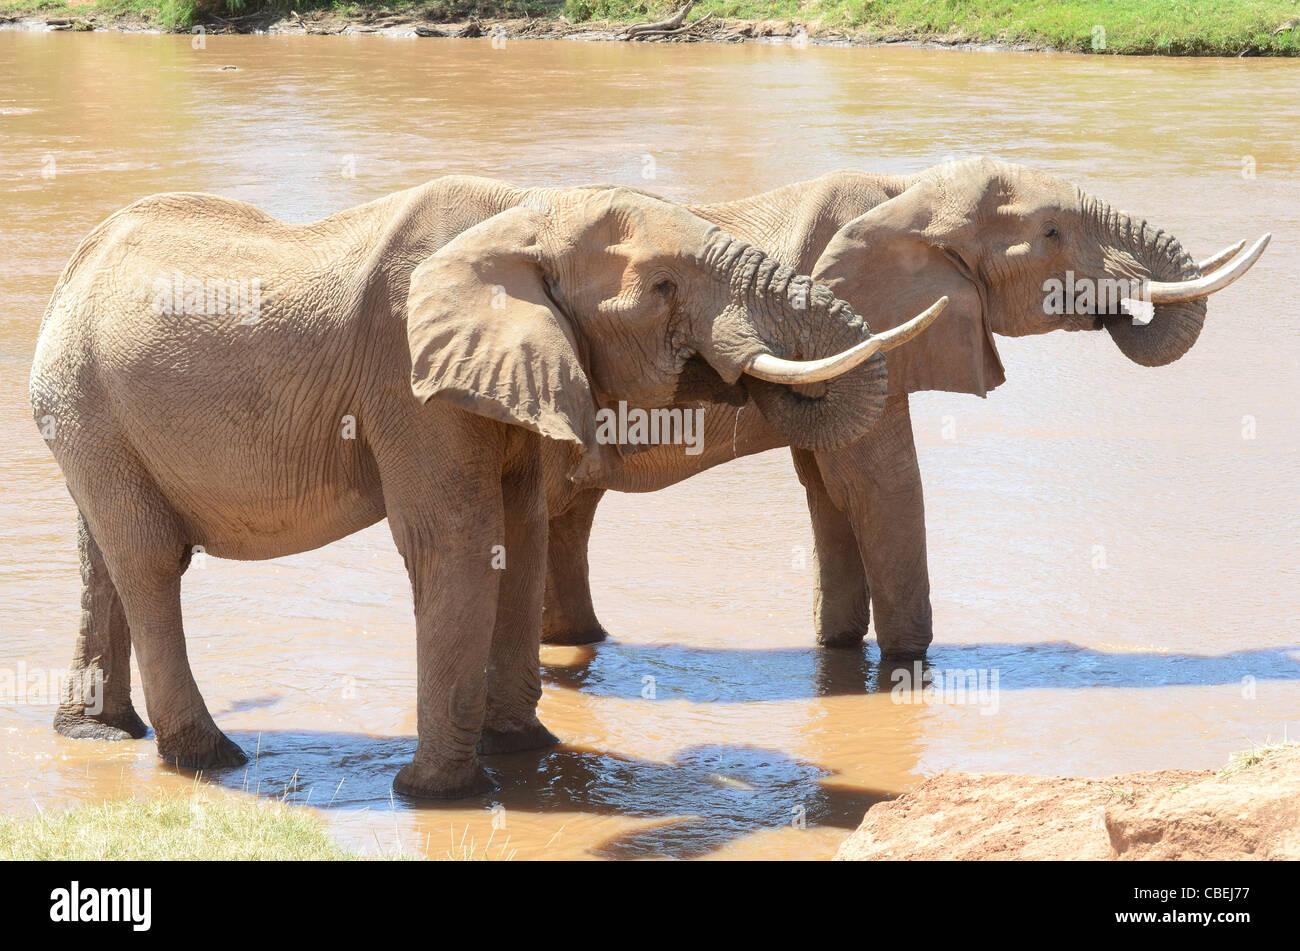 Kenya, Samburu National Reserve, Kenya, African Elephants drinking water at a watering hole - Stock Image